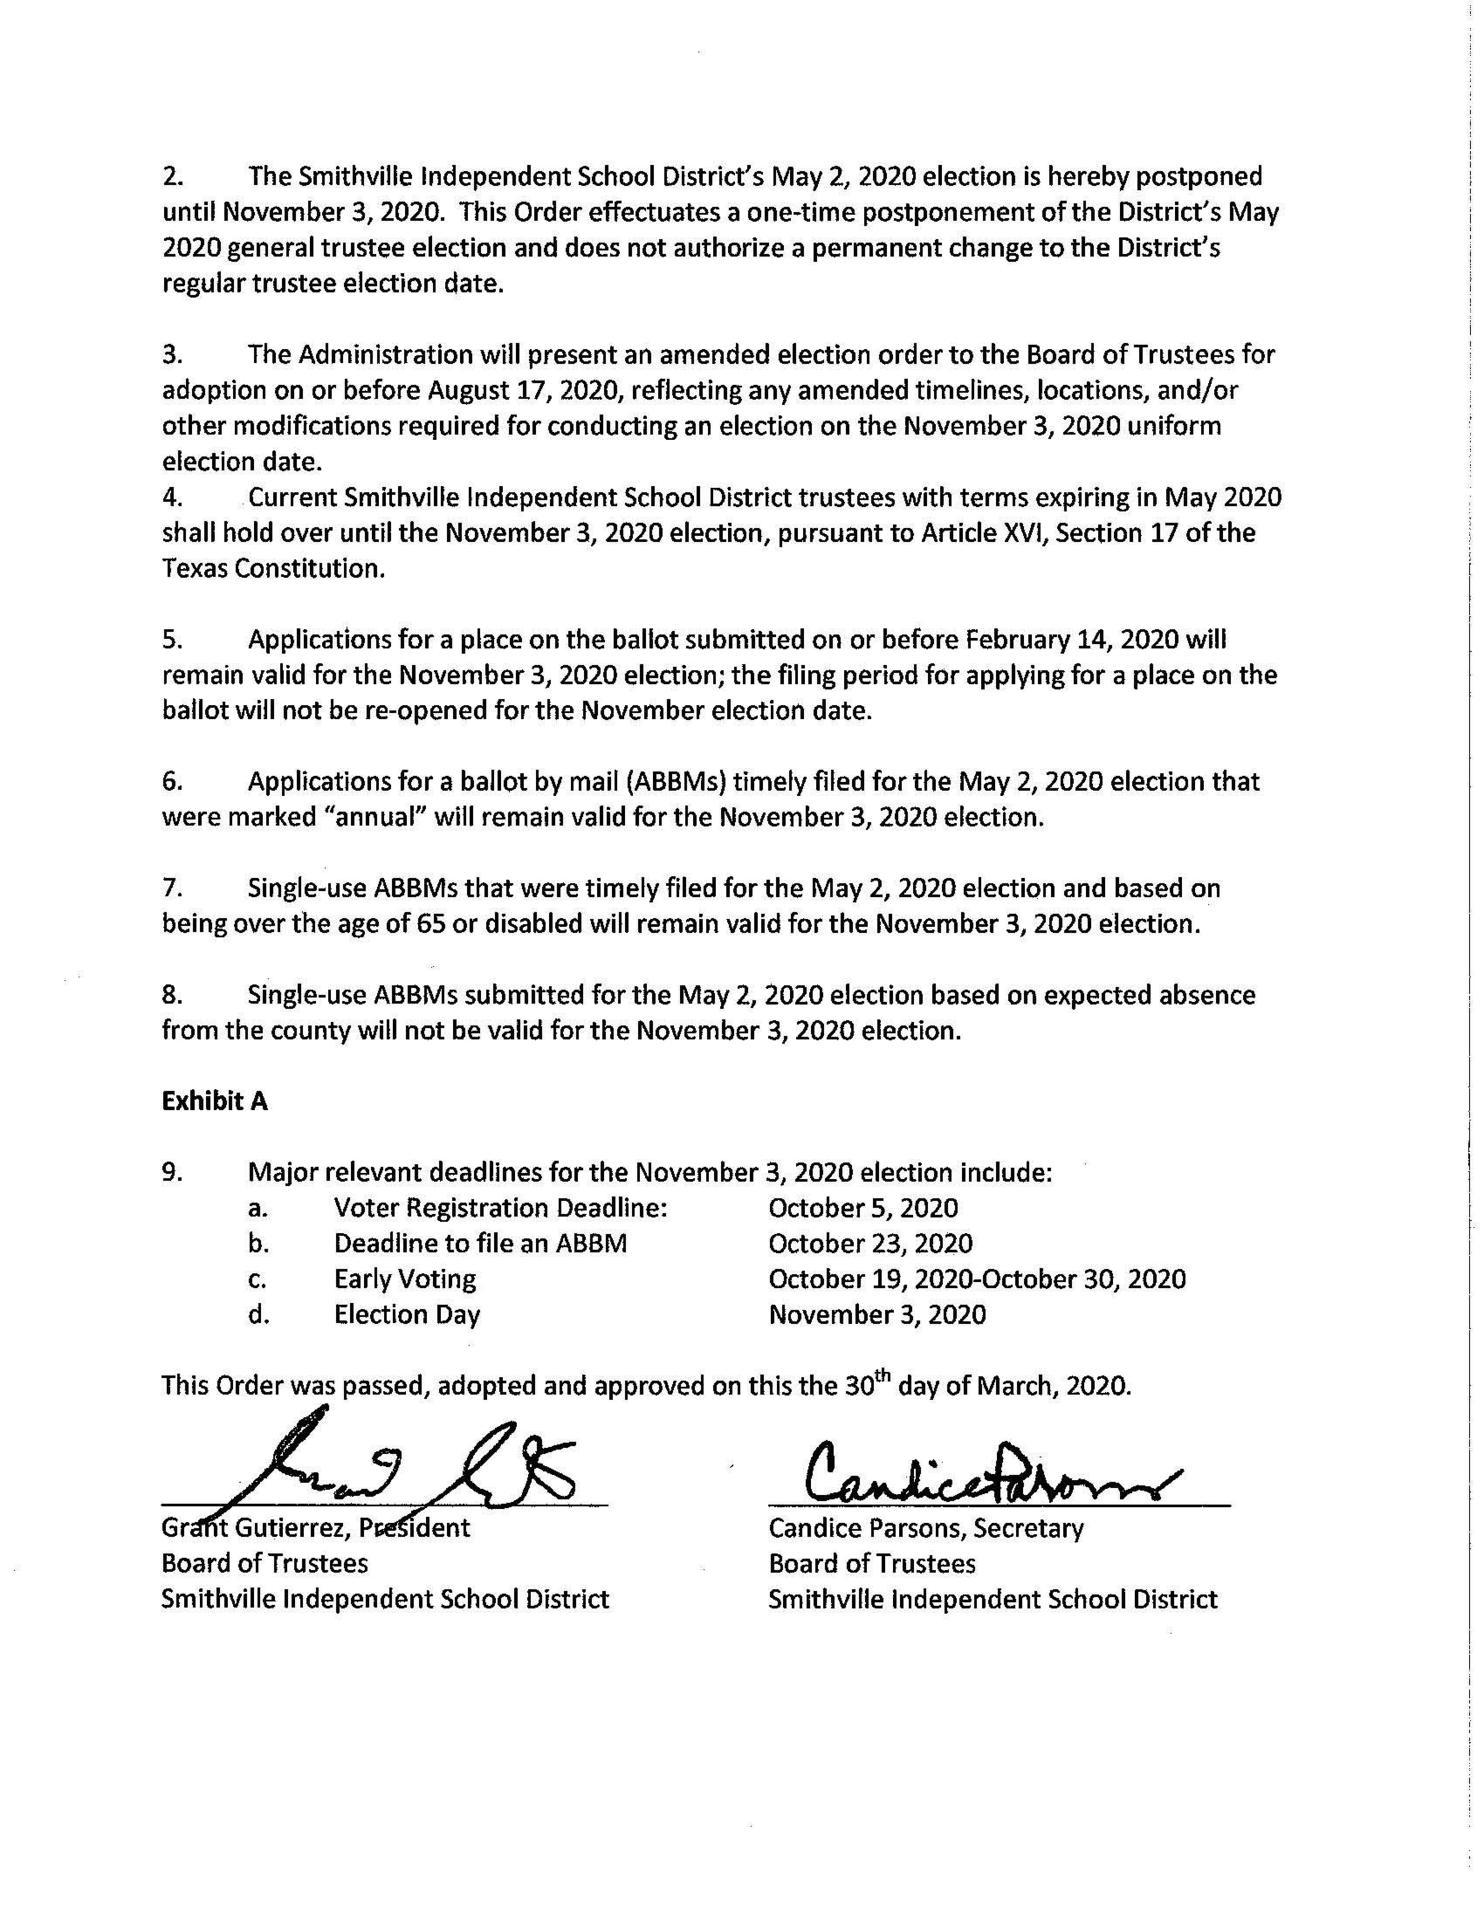 Order of Postponement page 2